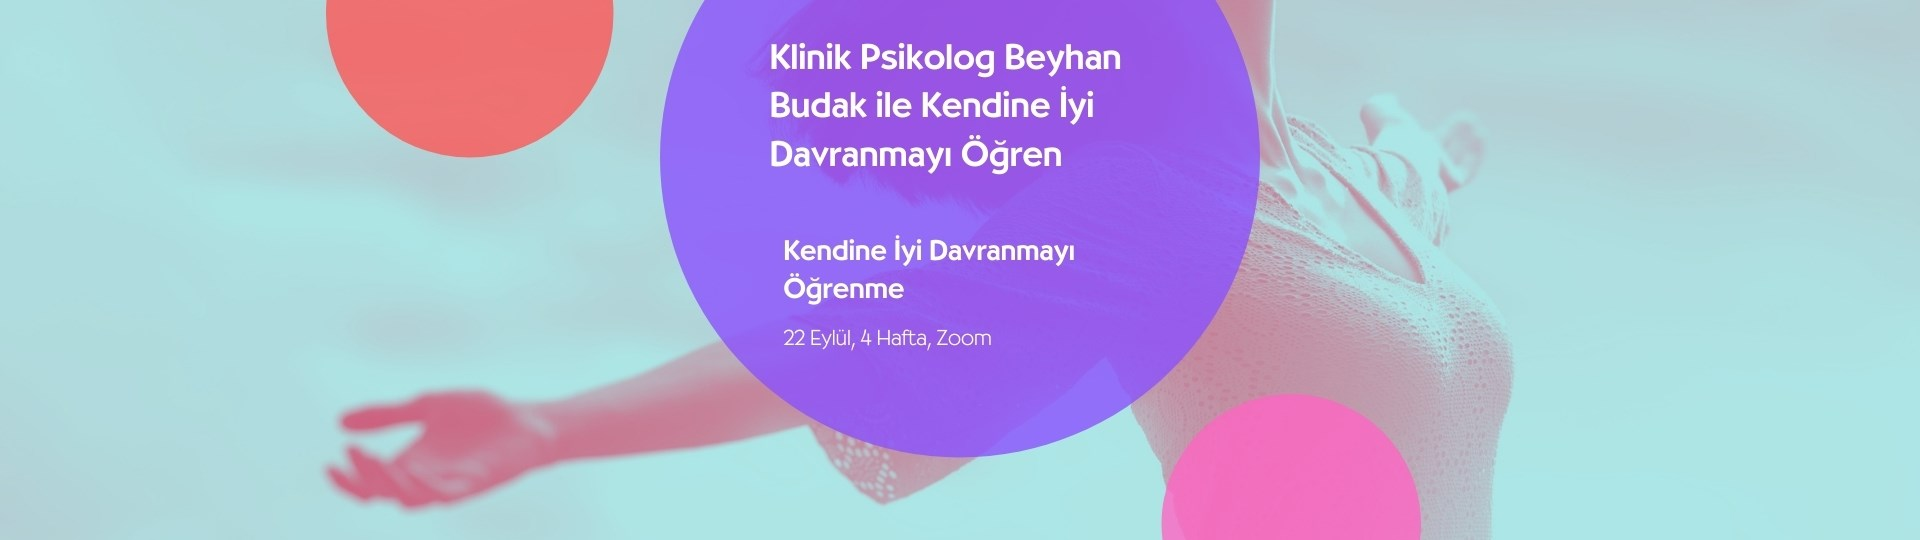 banner poster